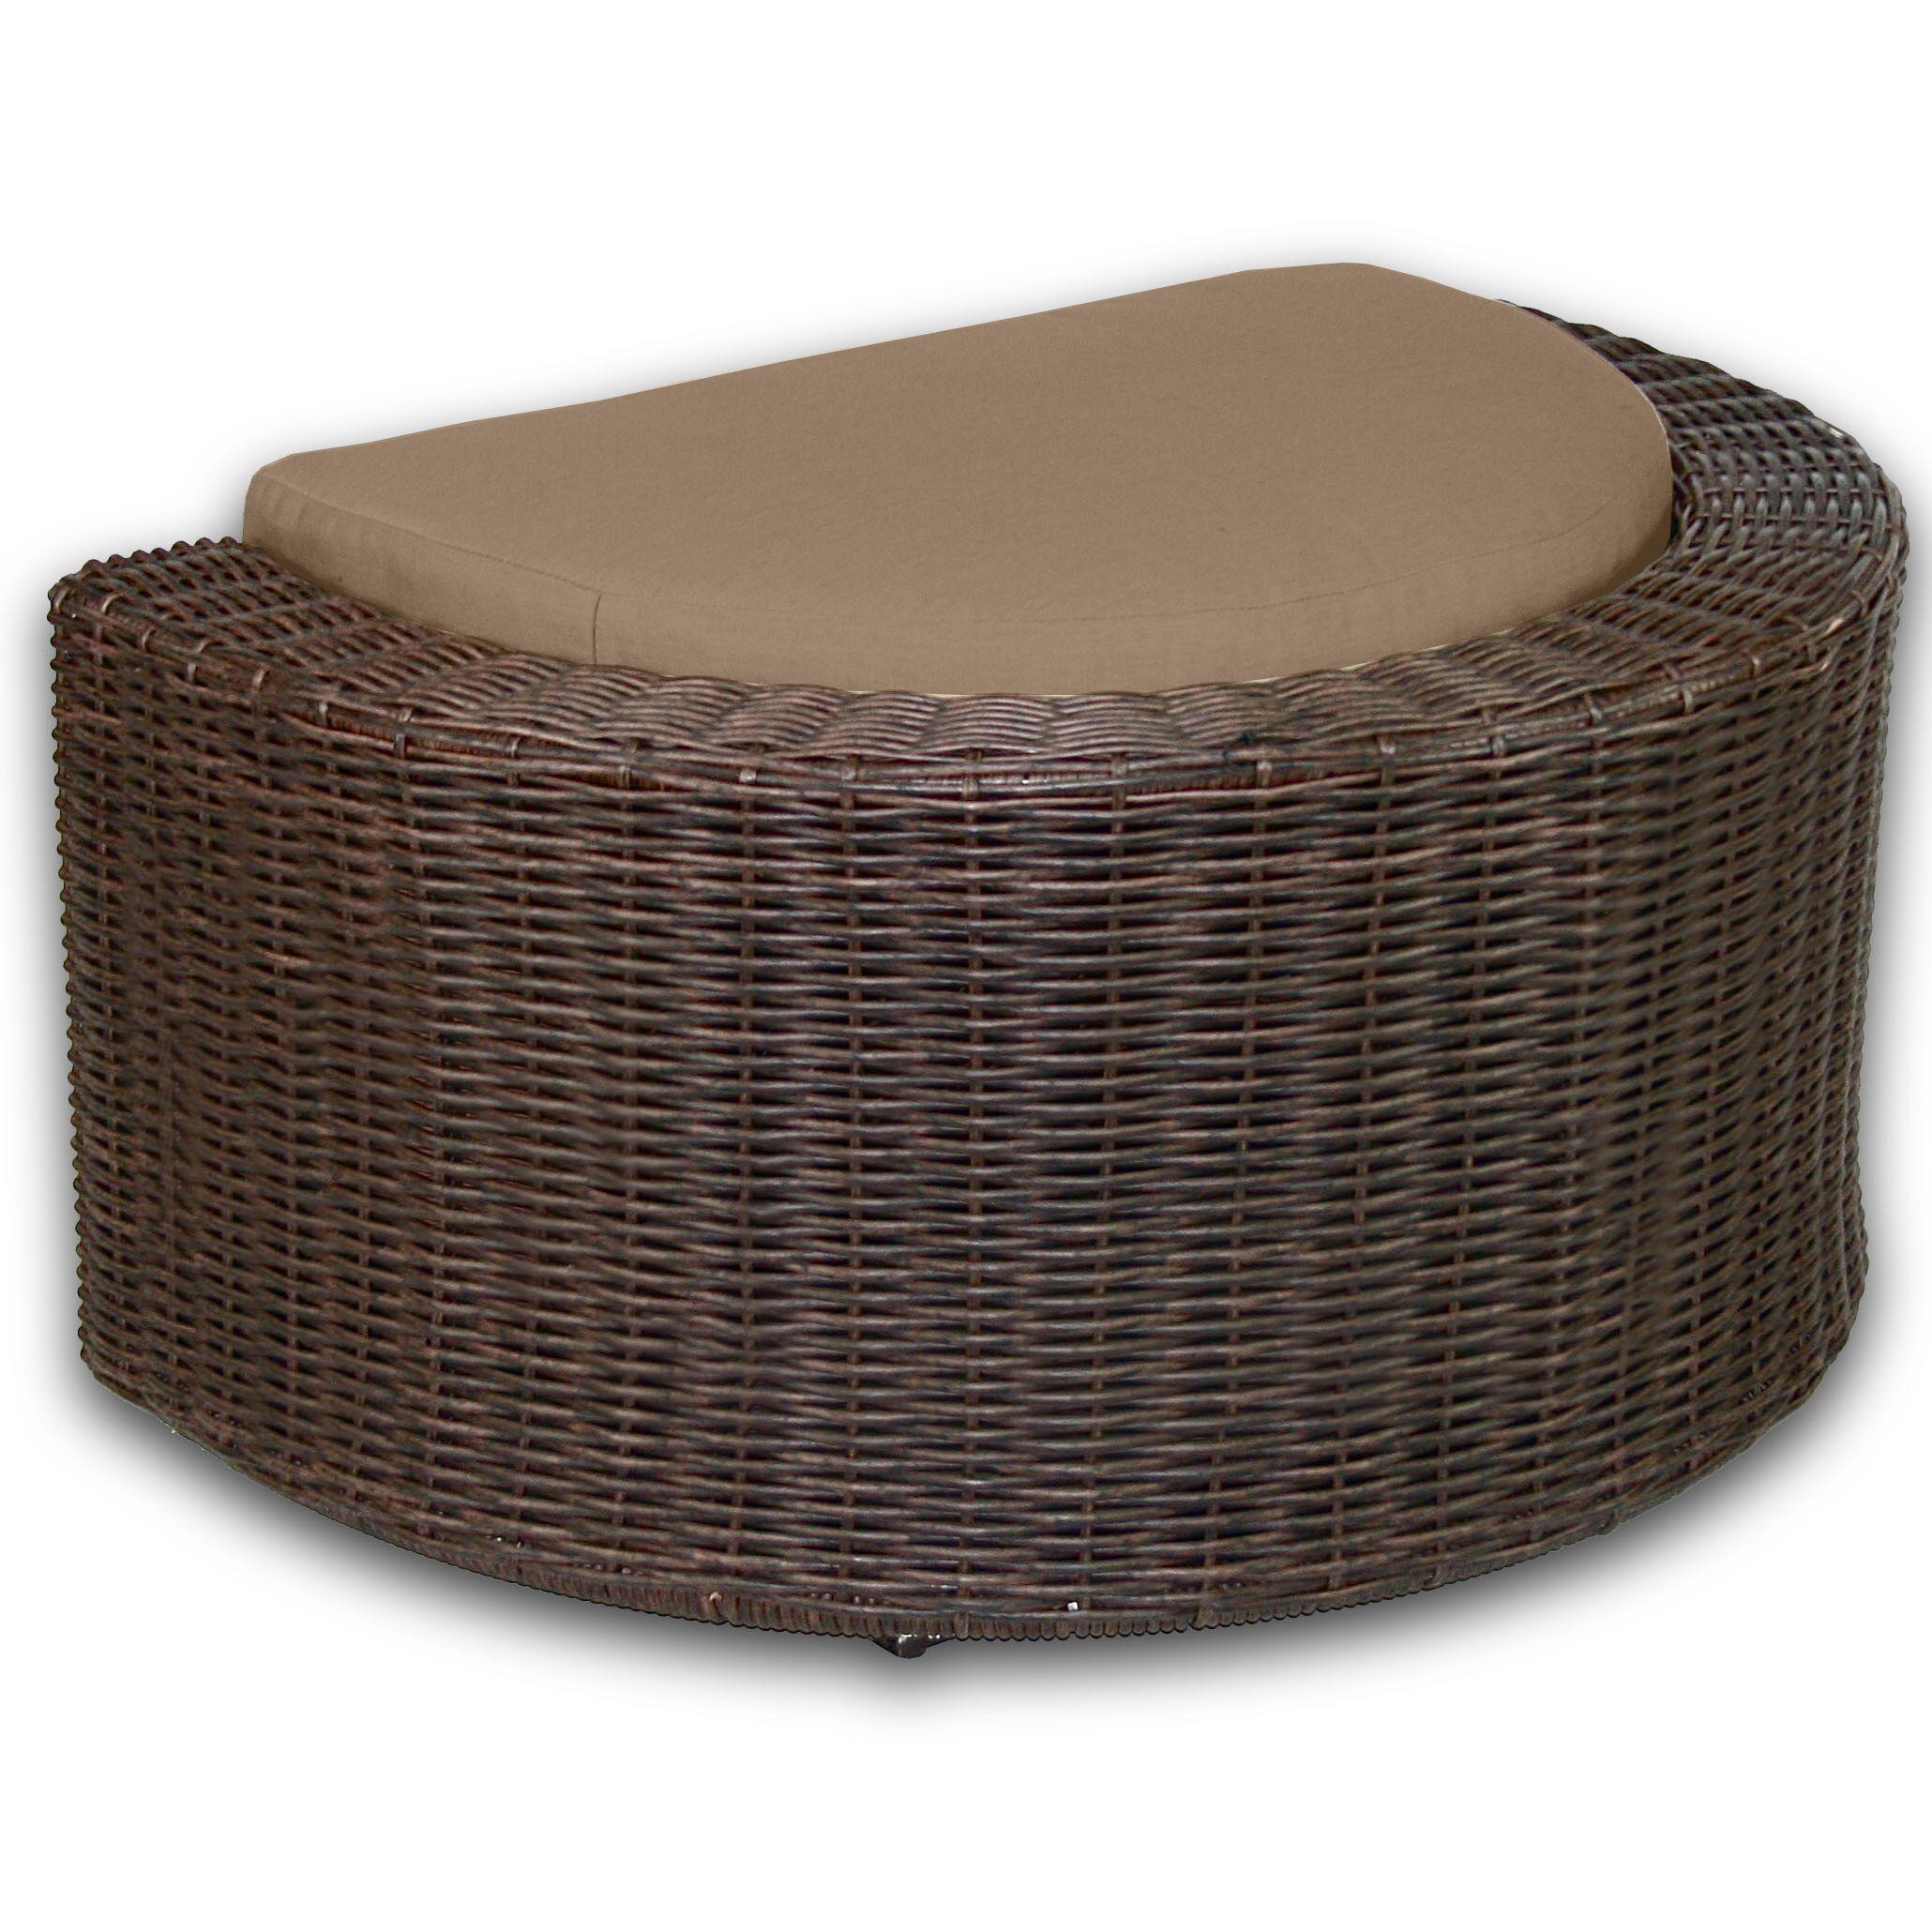 Palomar Ottoman with Cushion Fabric: Sierra